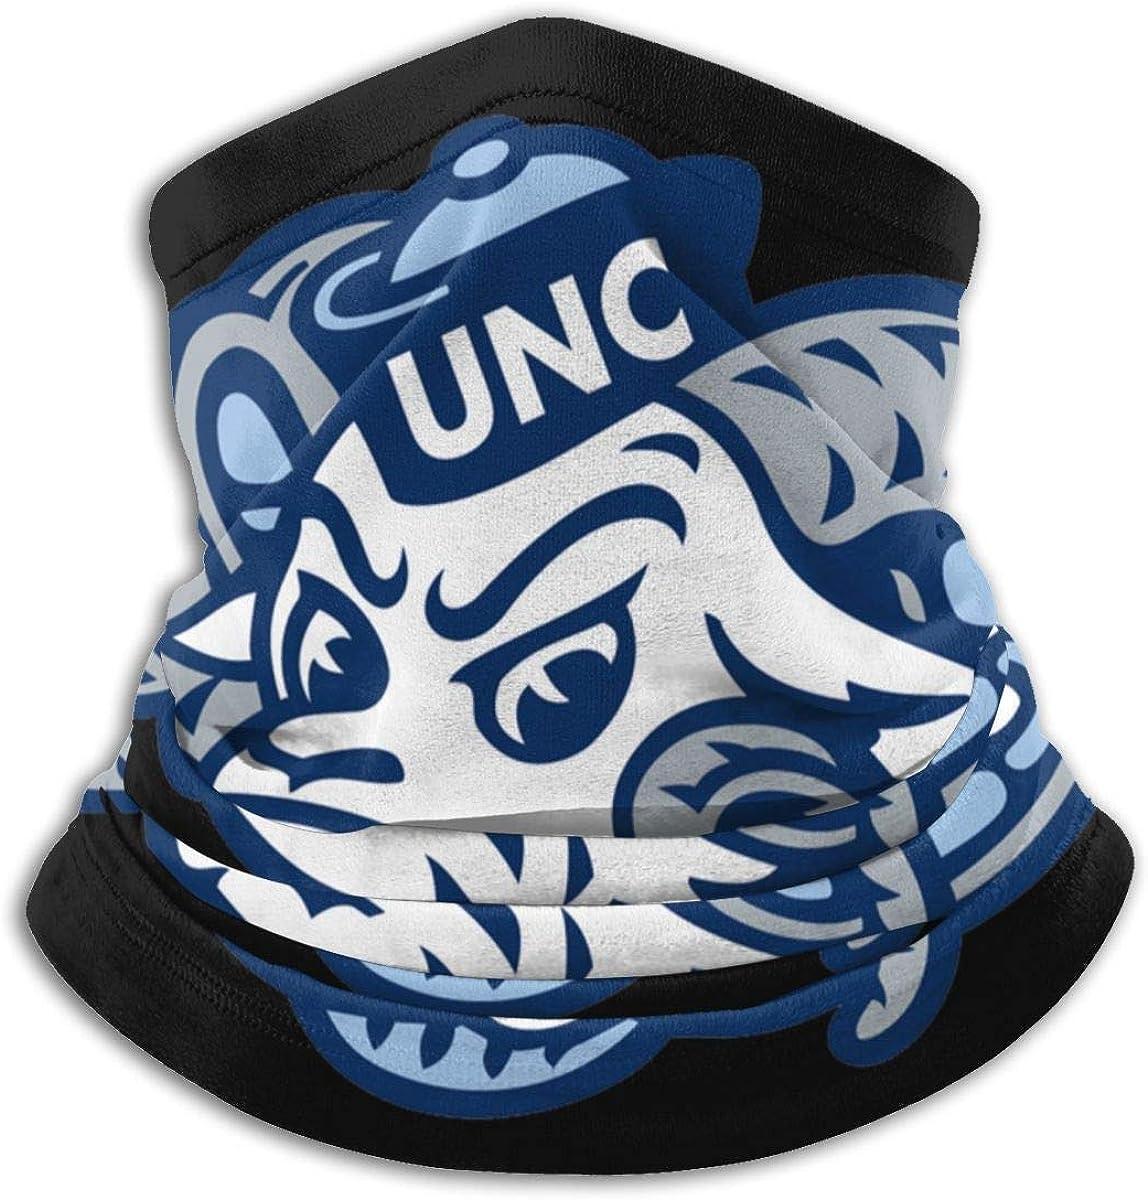 North Carolina Tar Heels Neck Gaiter Masks Breathable Sport Workout Yoga Outdoor face Nose Covers for Men Women